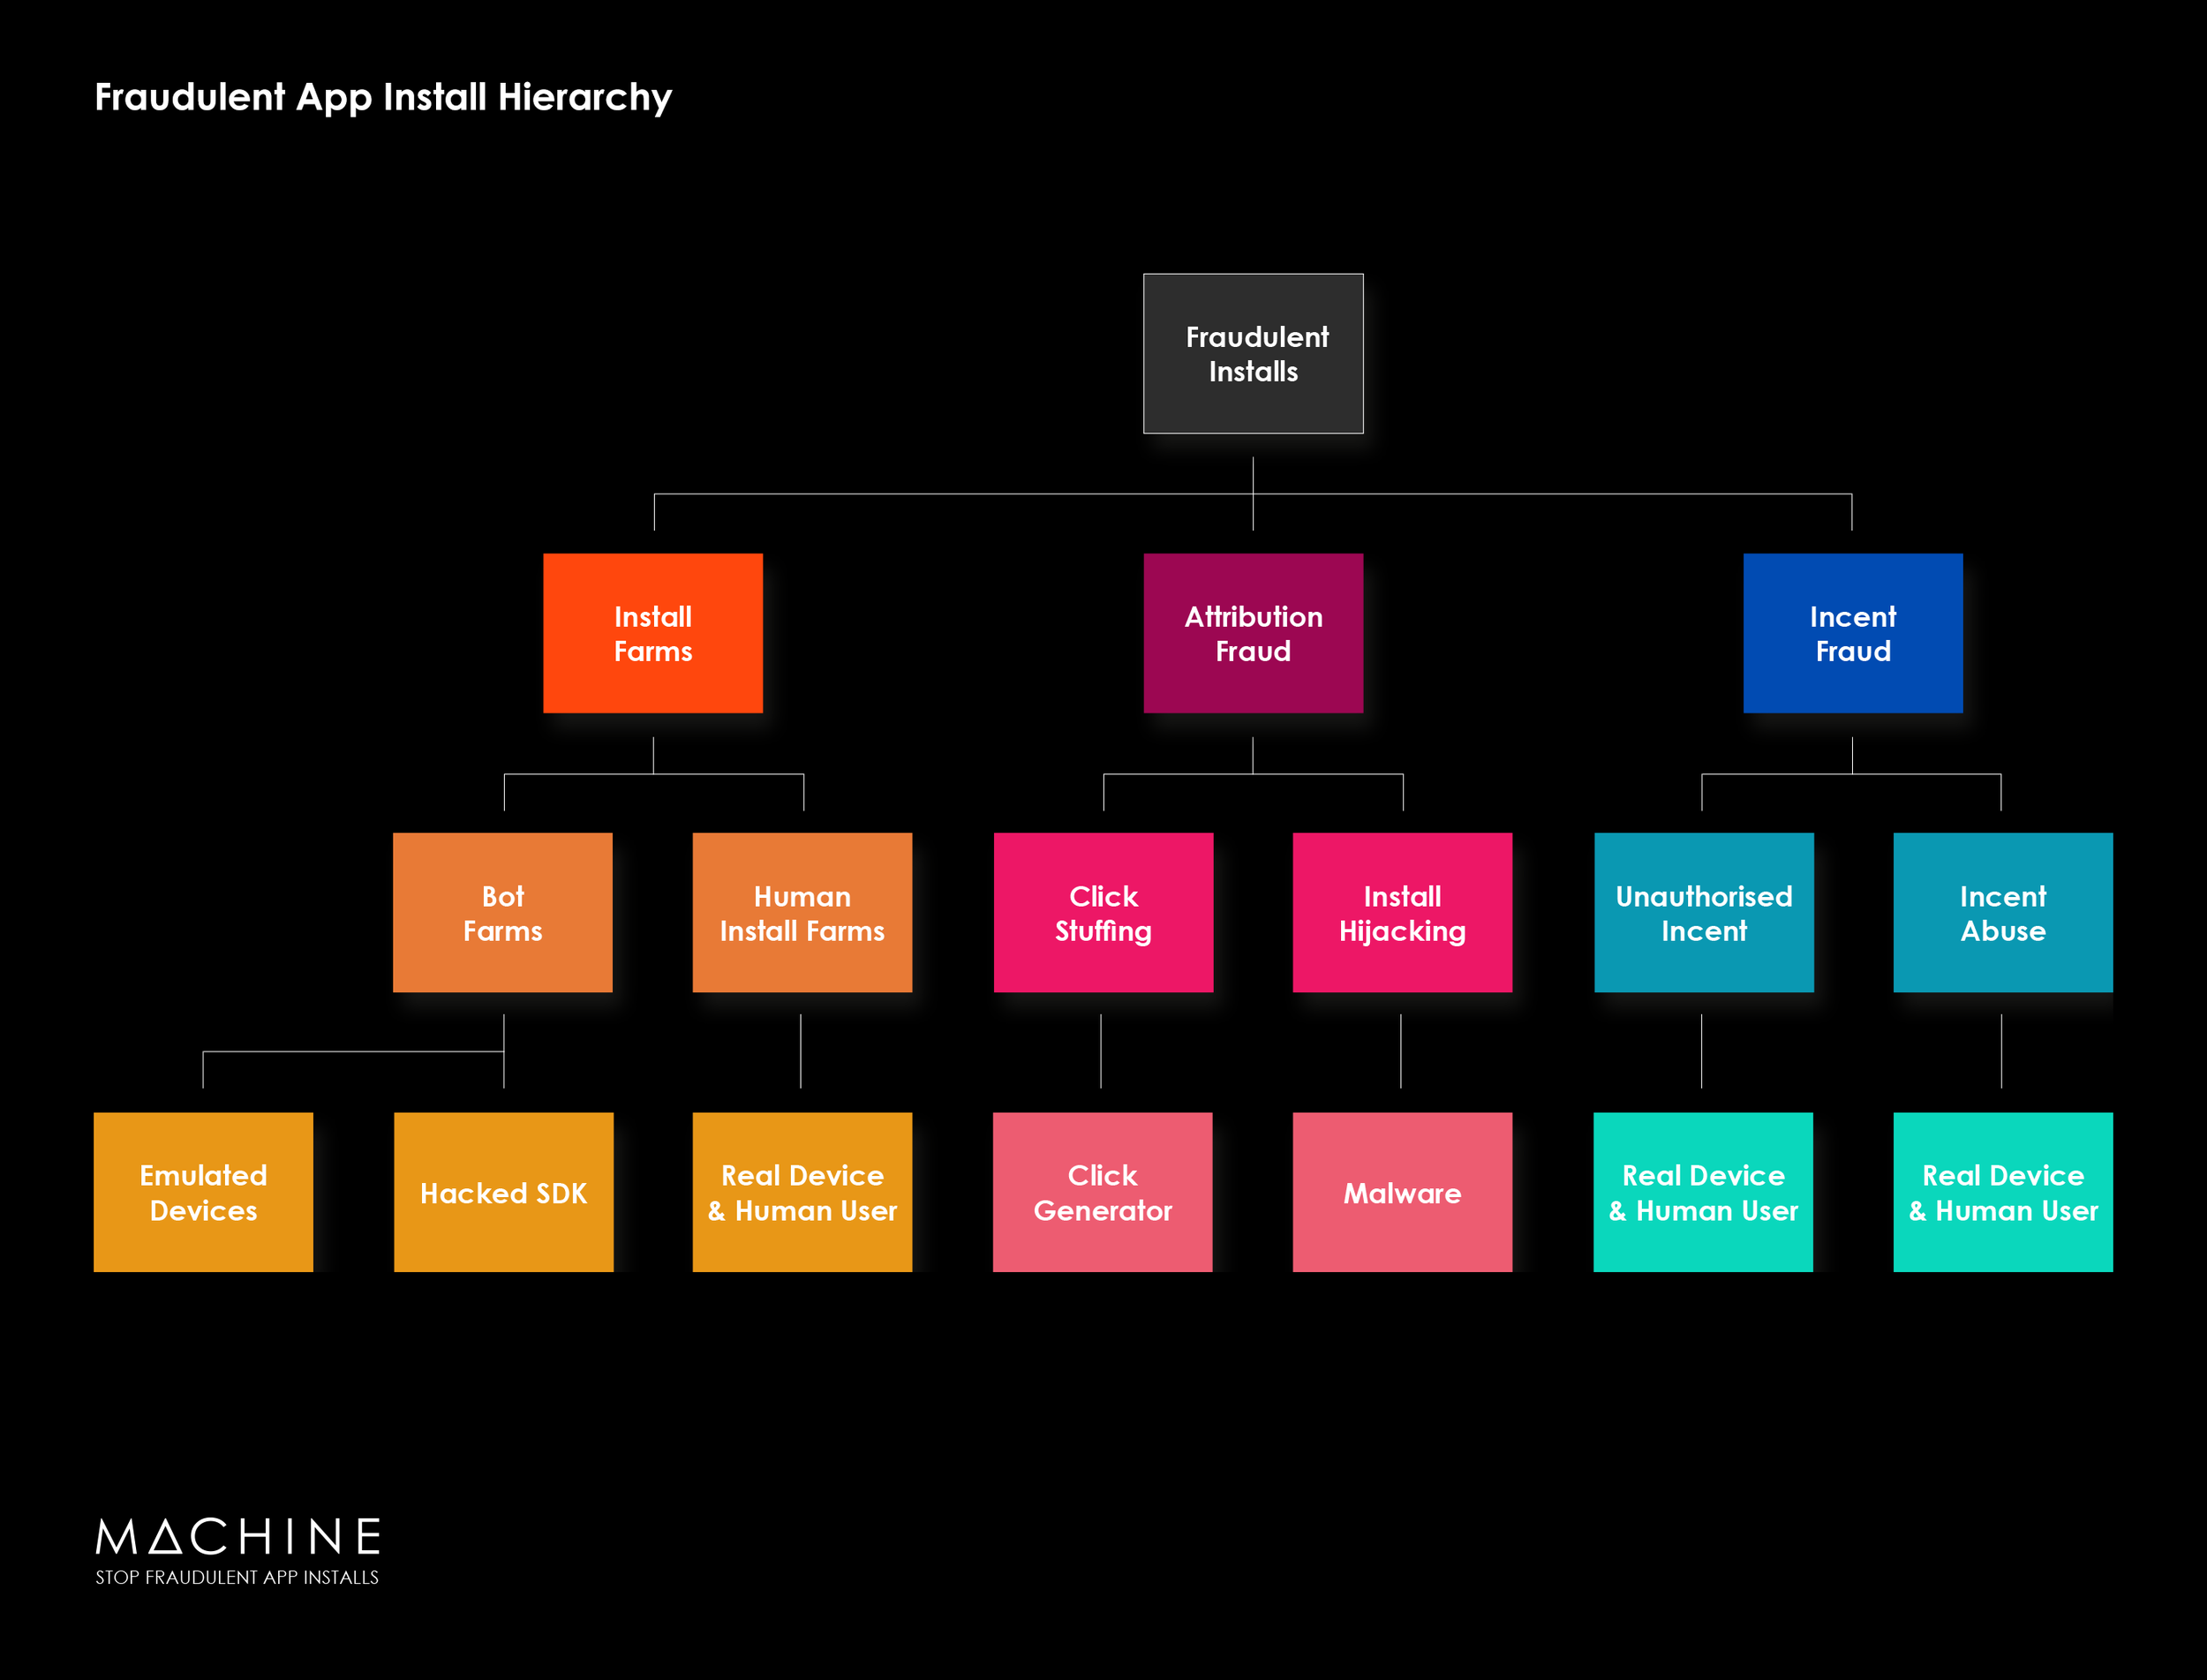 Blog: Fraudulent App Install Hierarchy